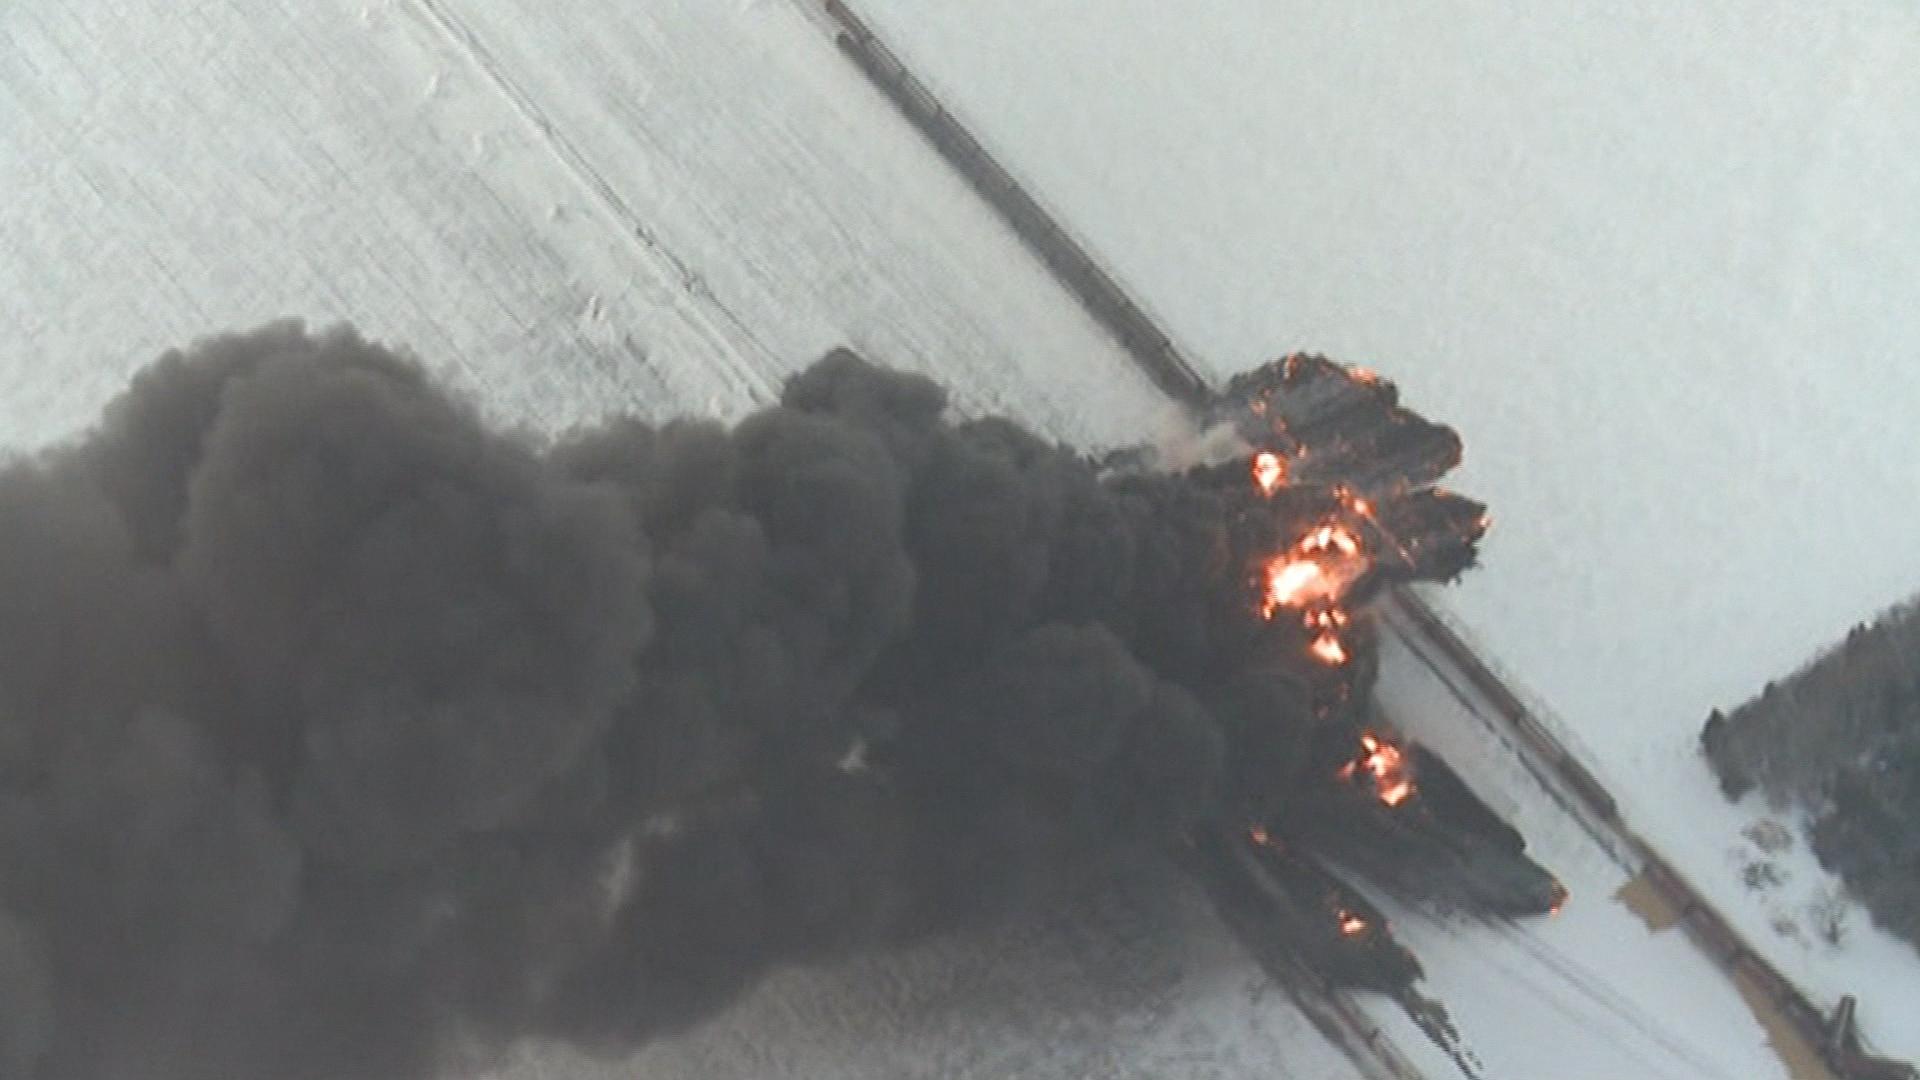 Disastrous record shows tank car hazard